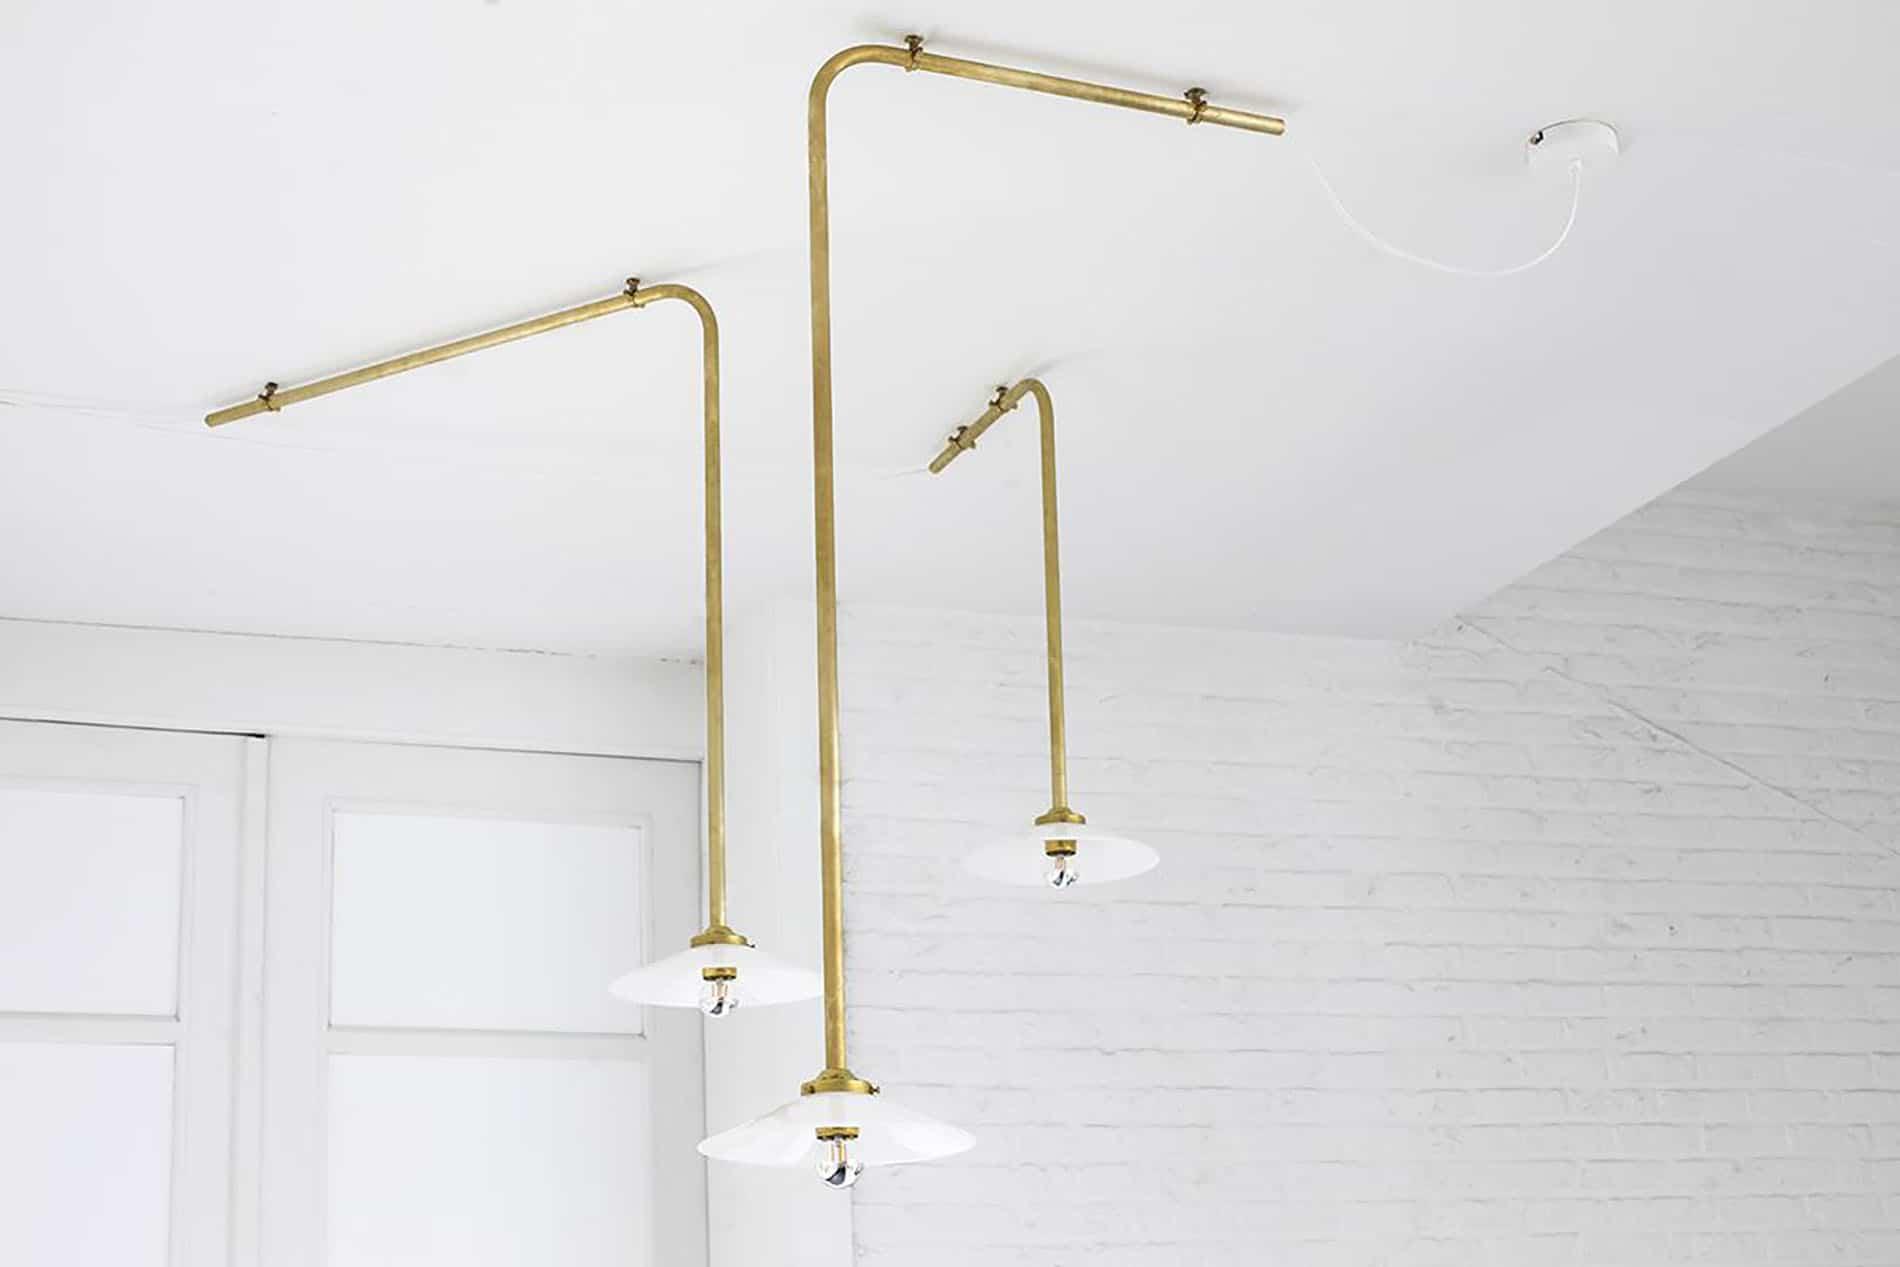 oro trend 2018 lampada industriale minimale oro valerie objects